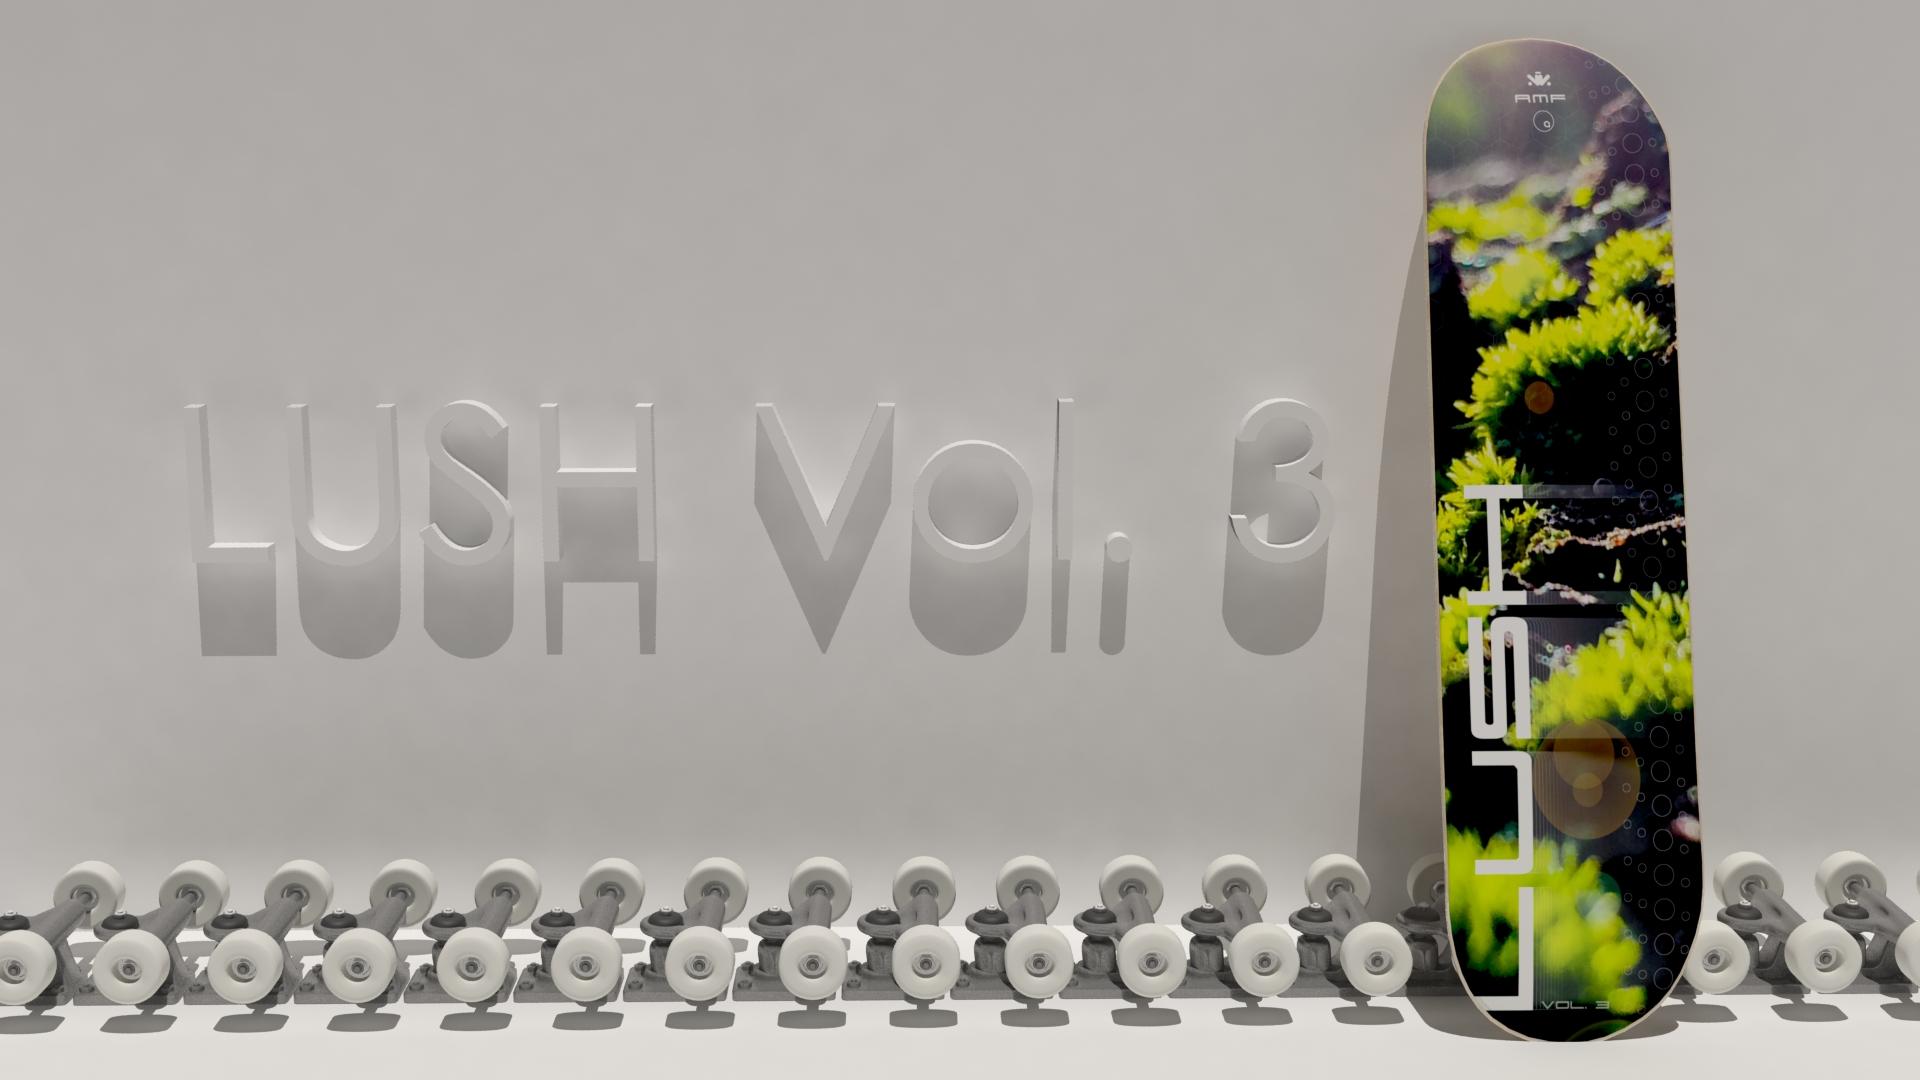 Lush Vol. 3